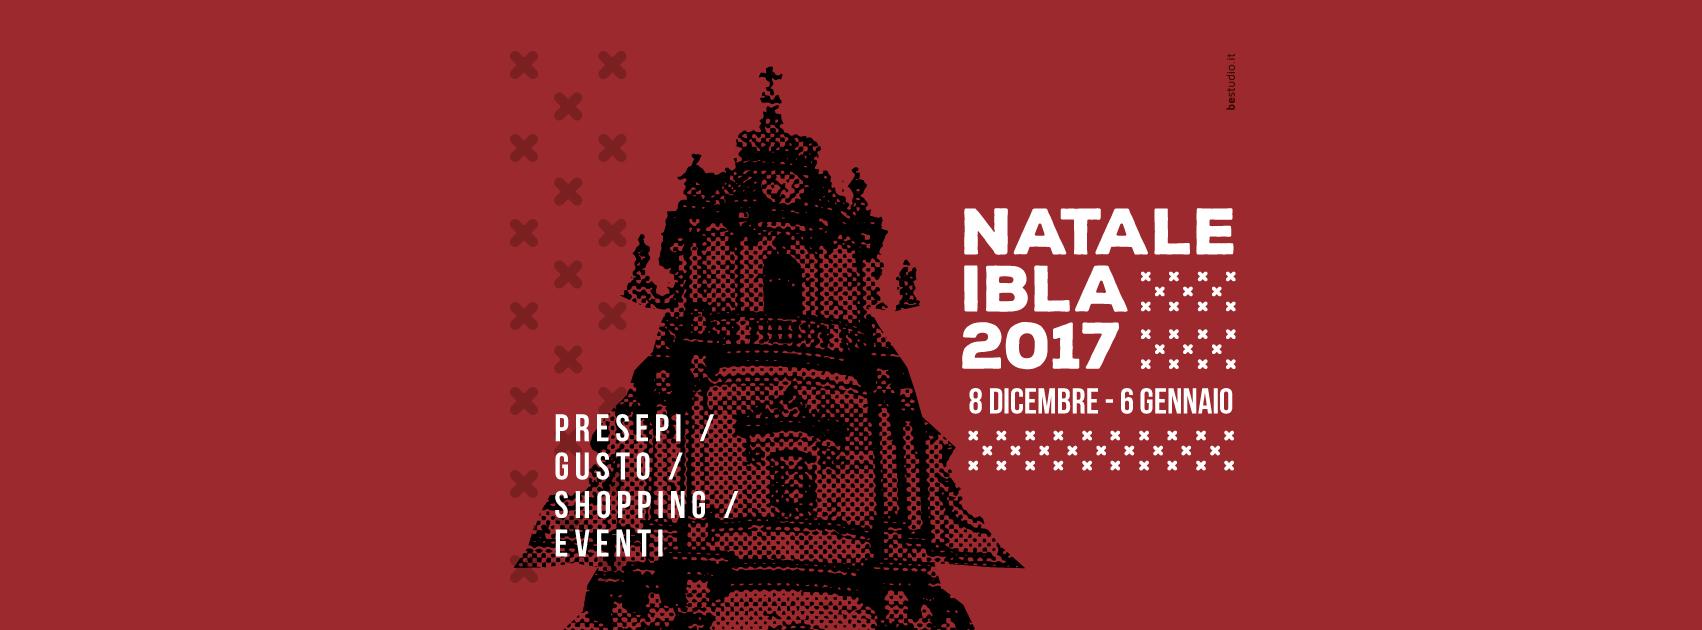 Natale a Ibla